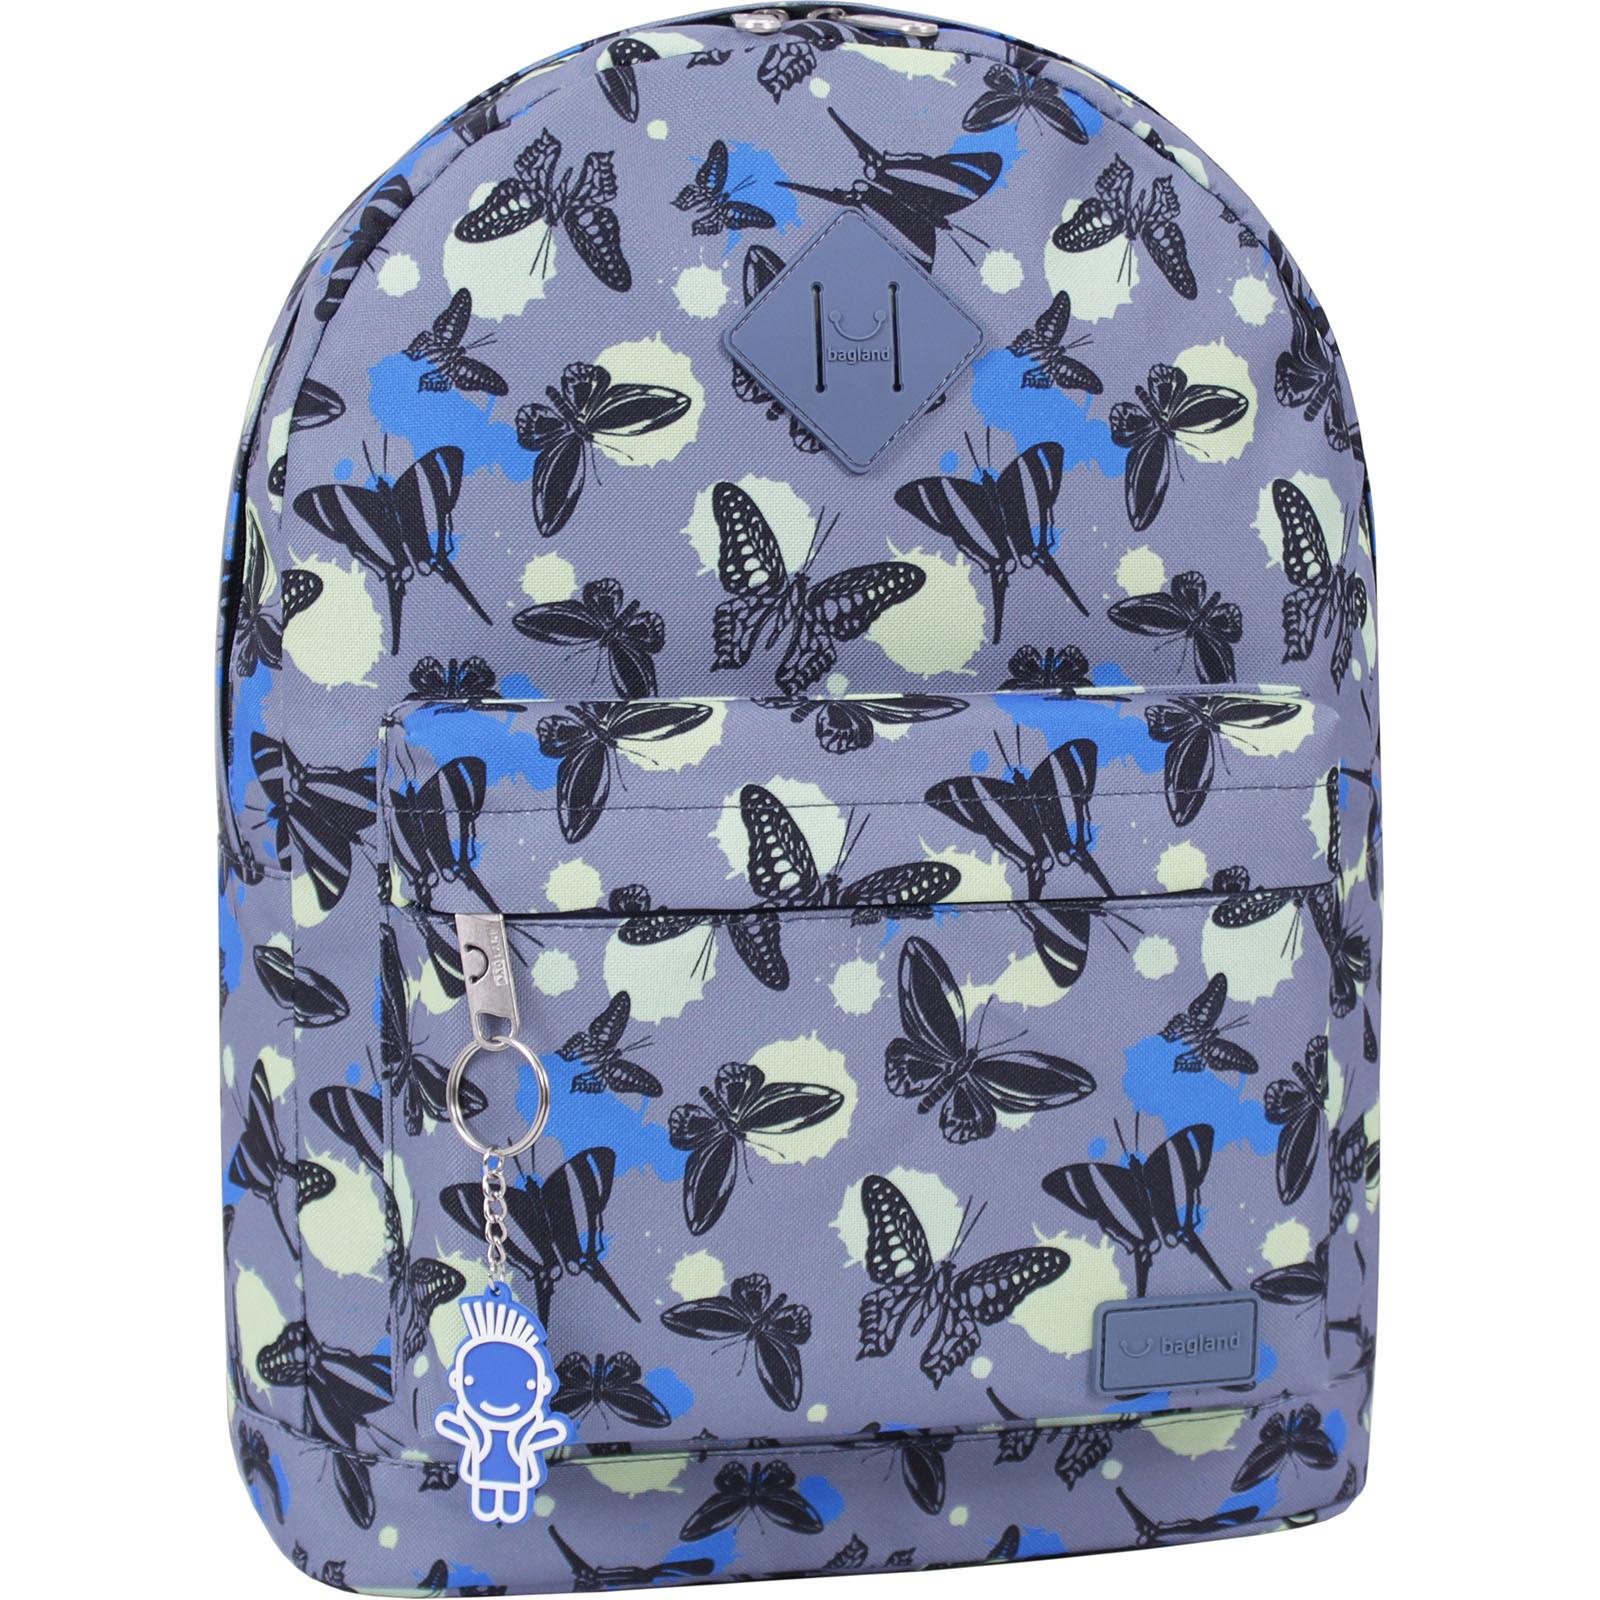 Городские рюкзаки Рюкзак Bagland Молодежный 17 л. сублимация 486 (00533664) IMG_9348_суб.486_.JPG